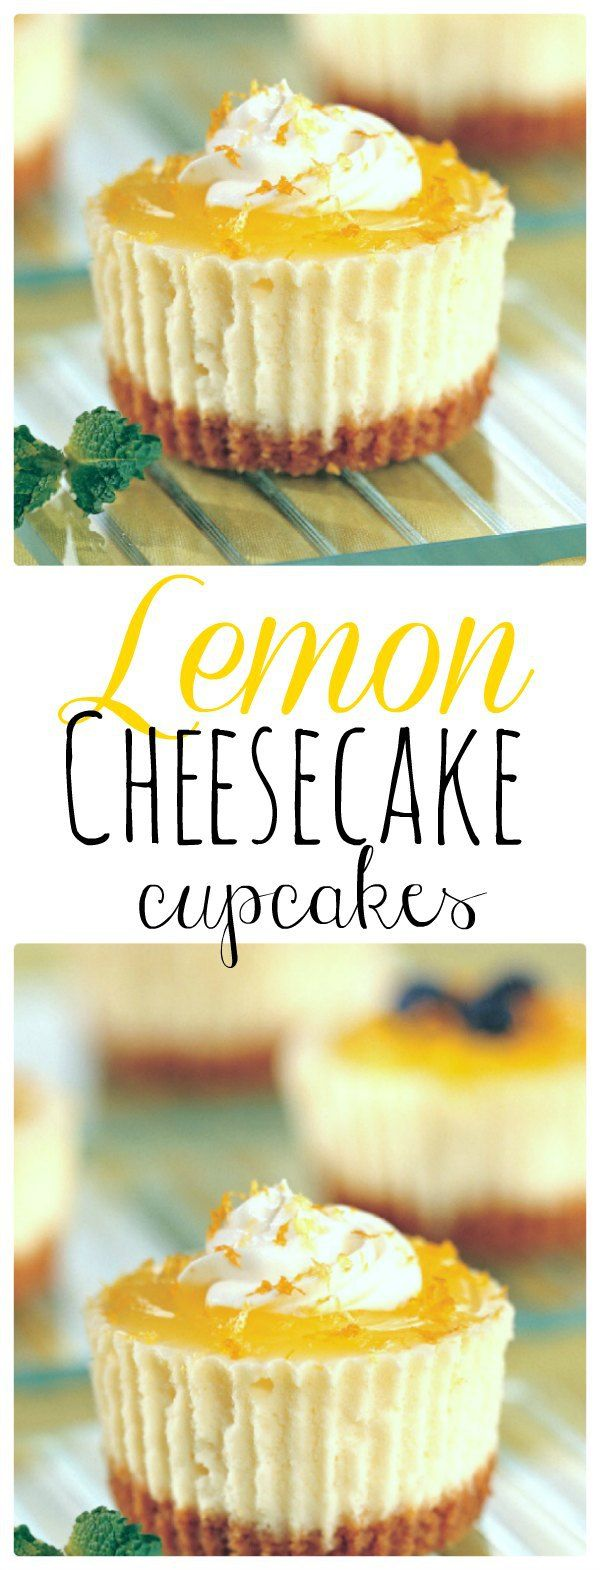 Lemon Cheesecake Cupcakes -   23 lemon cheesecake recipes ideas